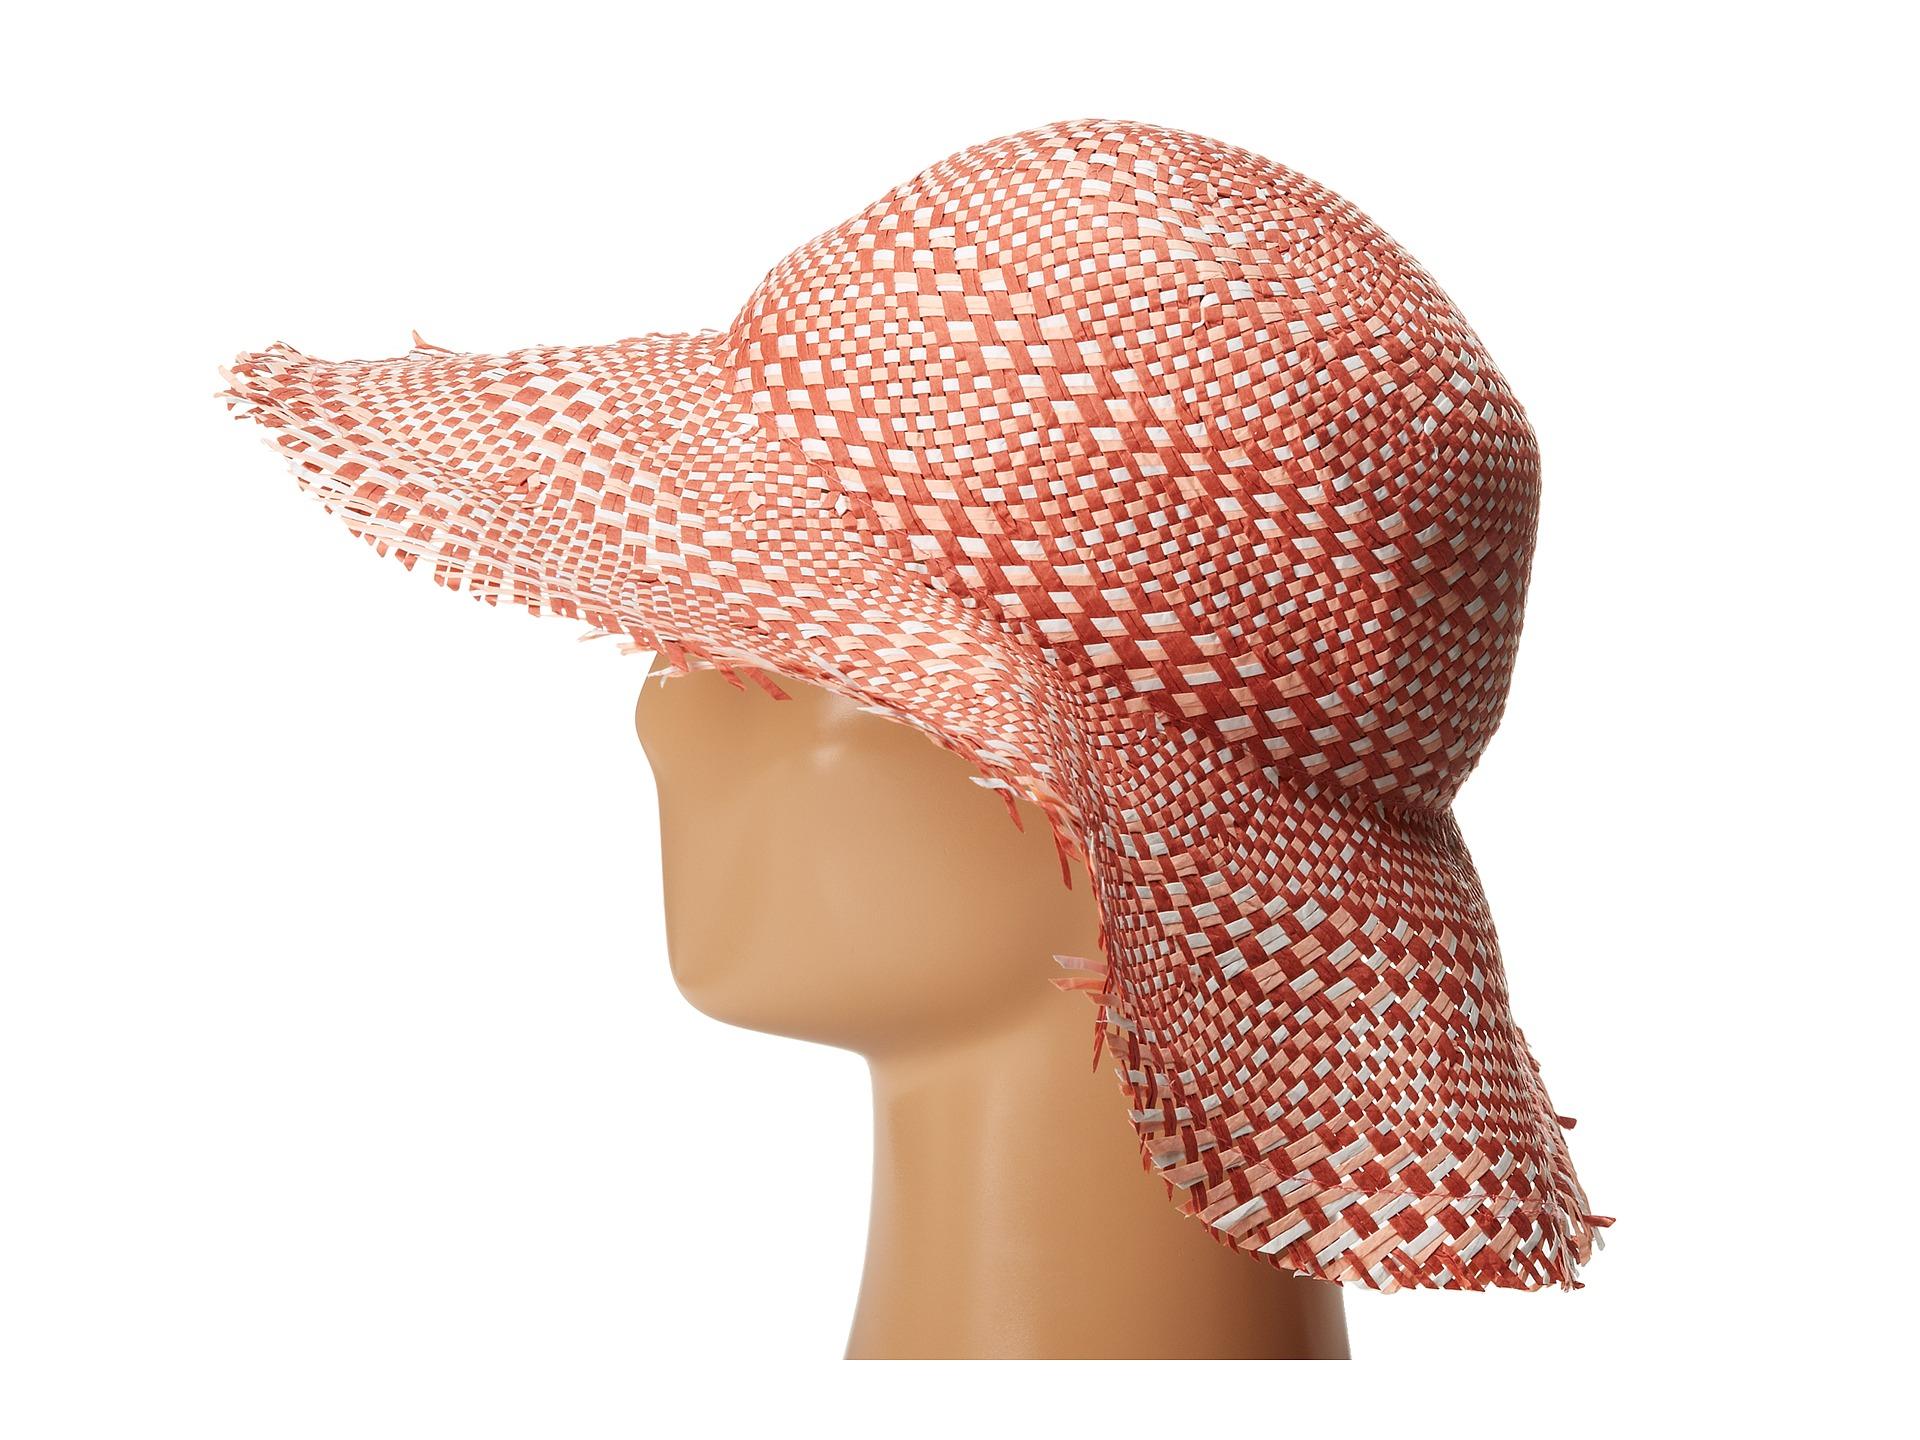 b3882bda075 Lyst - BCBGMAXAZRIA Multi Floppy Hat in Pink